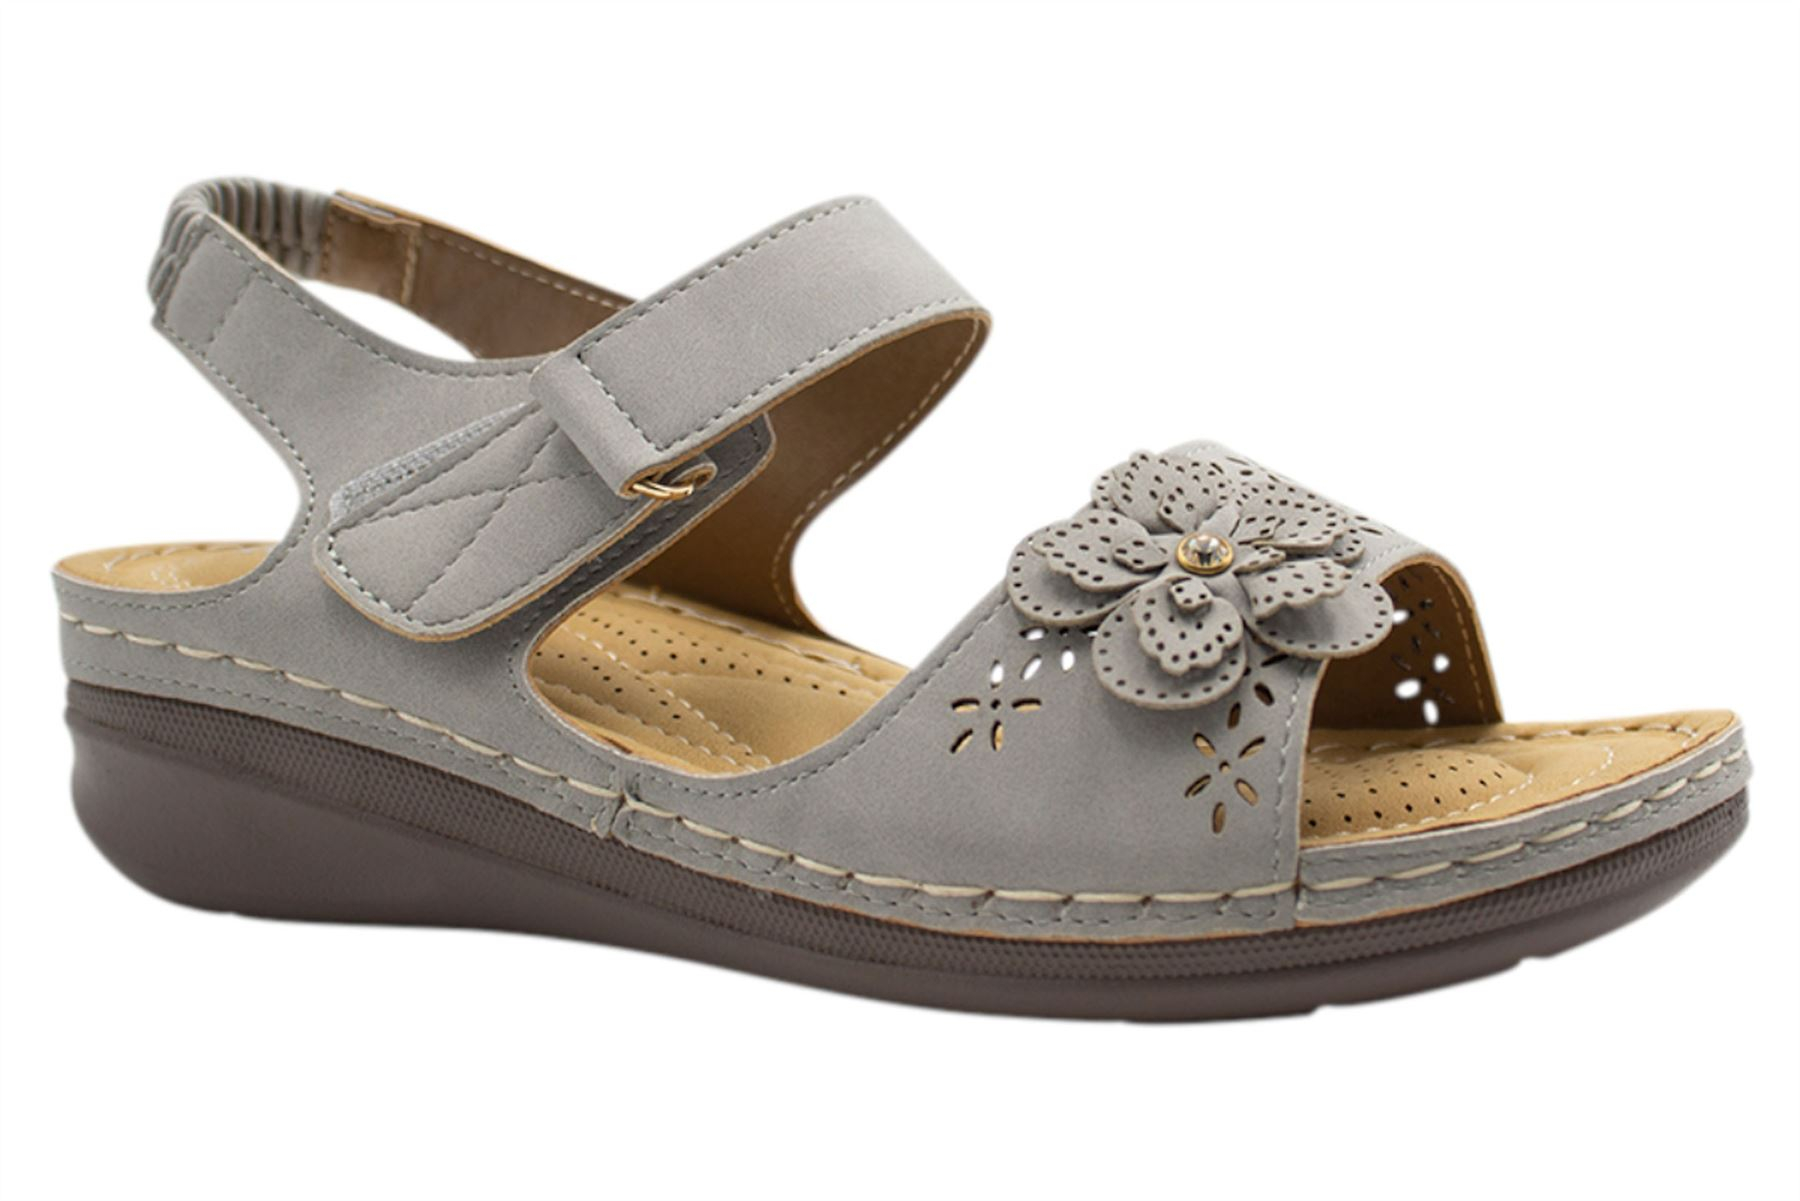 Ladies-Sandals-Womens-Mid-Heel-Comfort-Summer-Beach-Casual-Wear miniatura 21